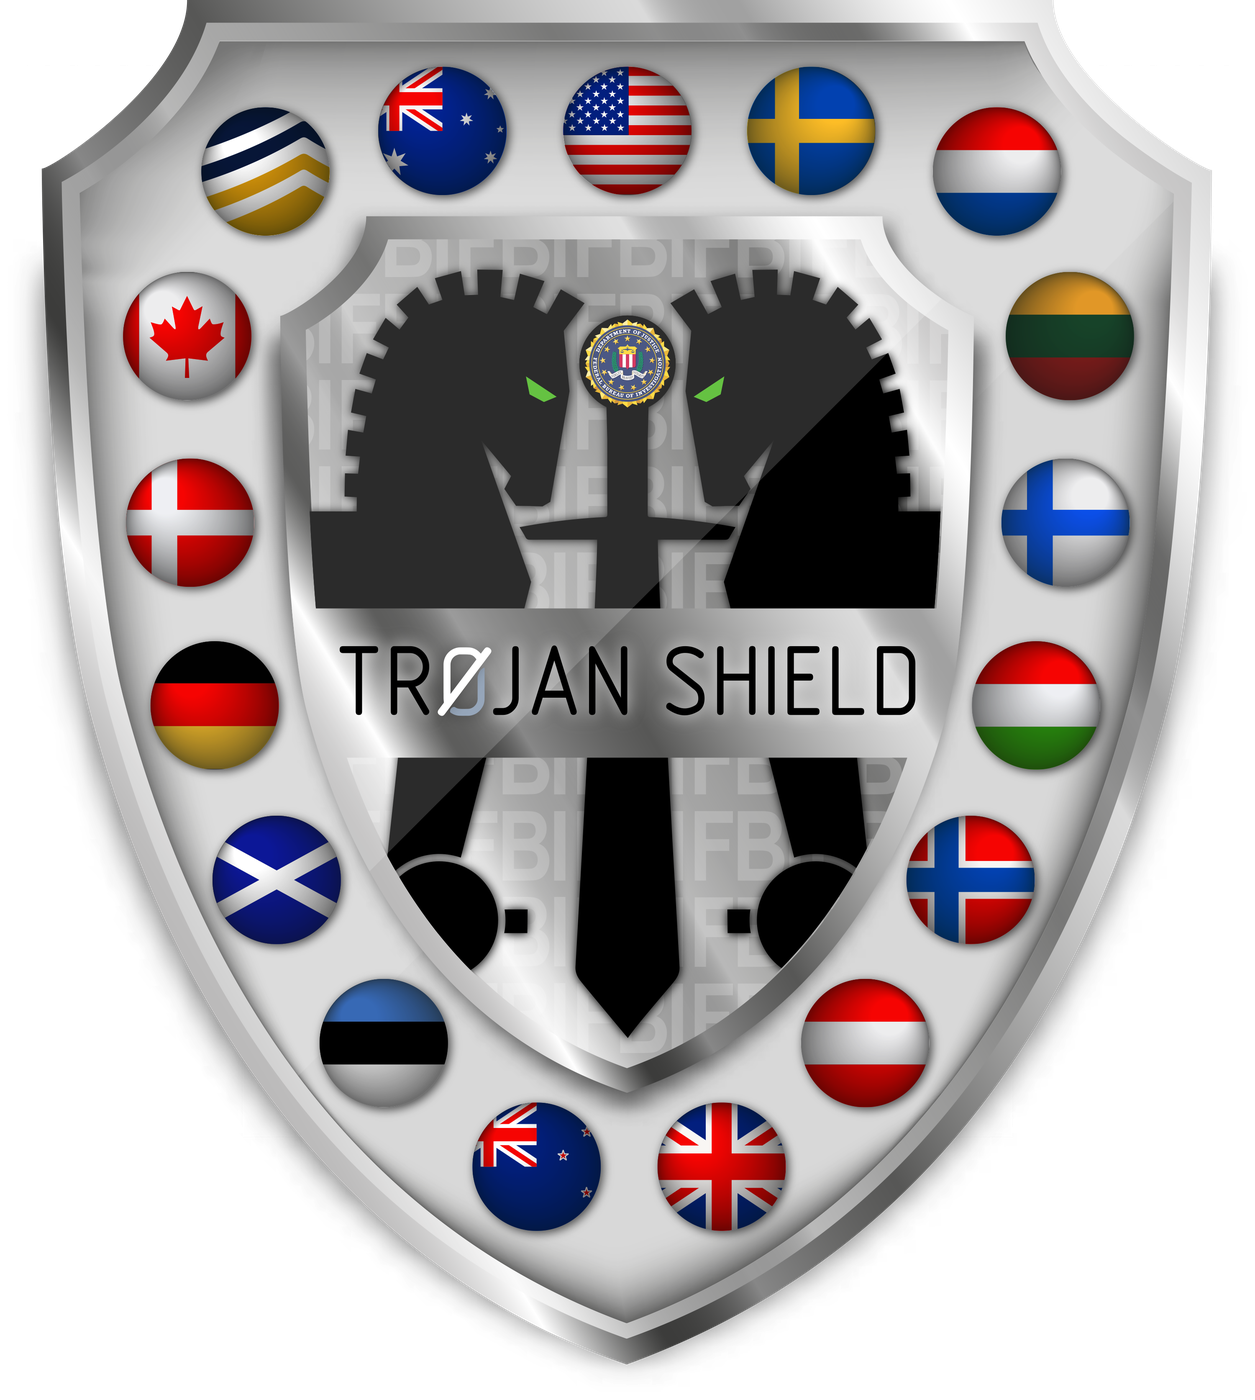 Operation Trojan Shield - Seal